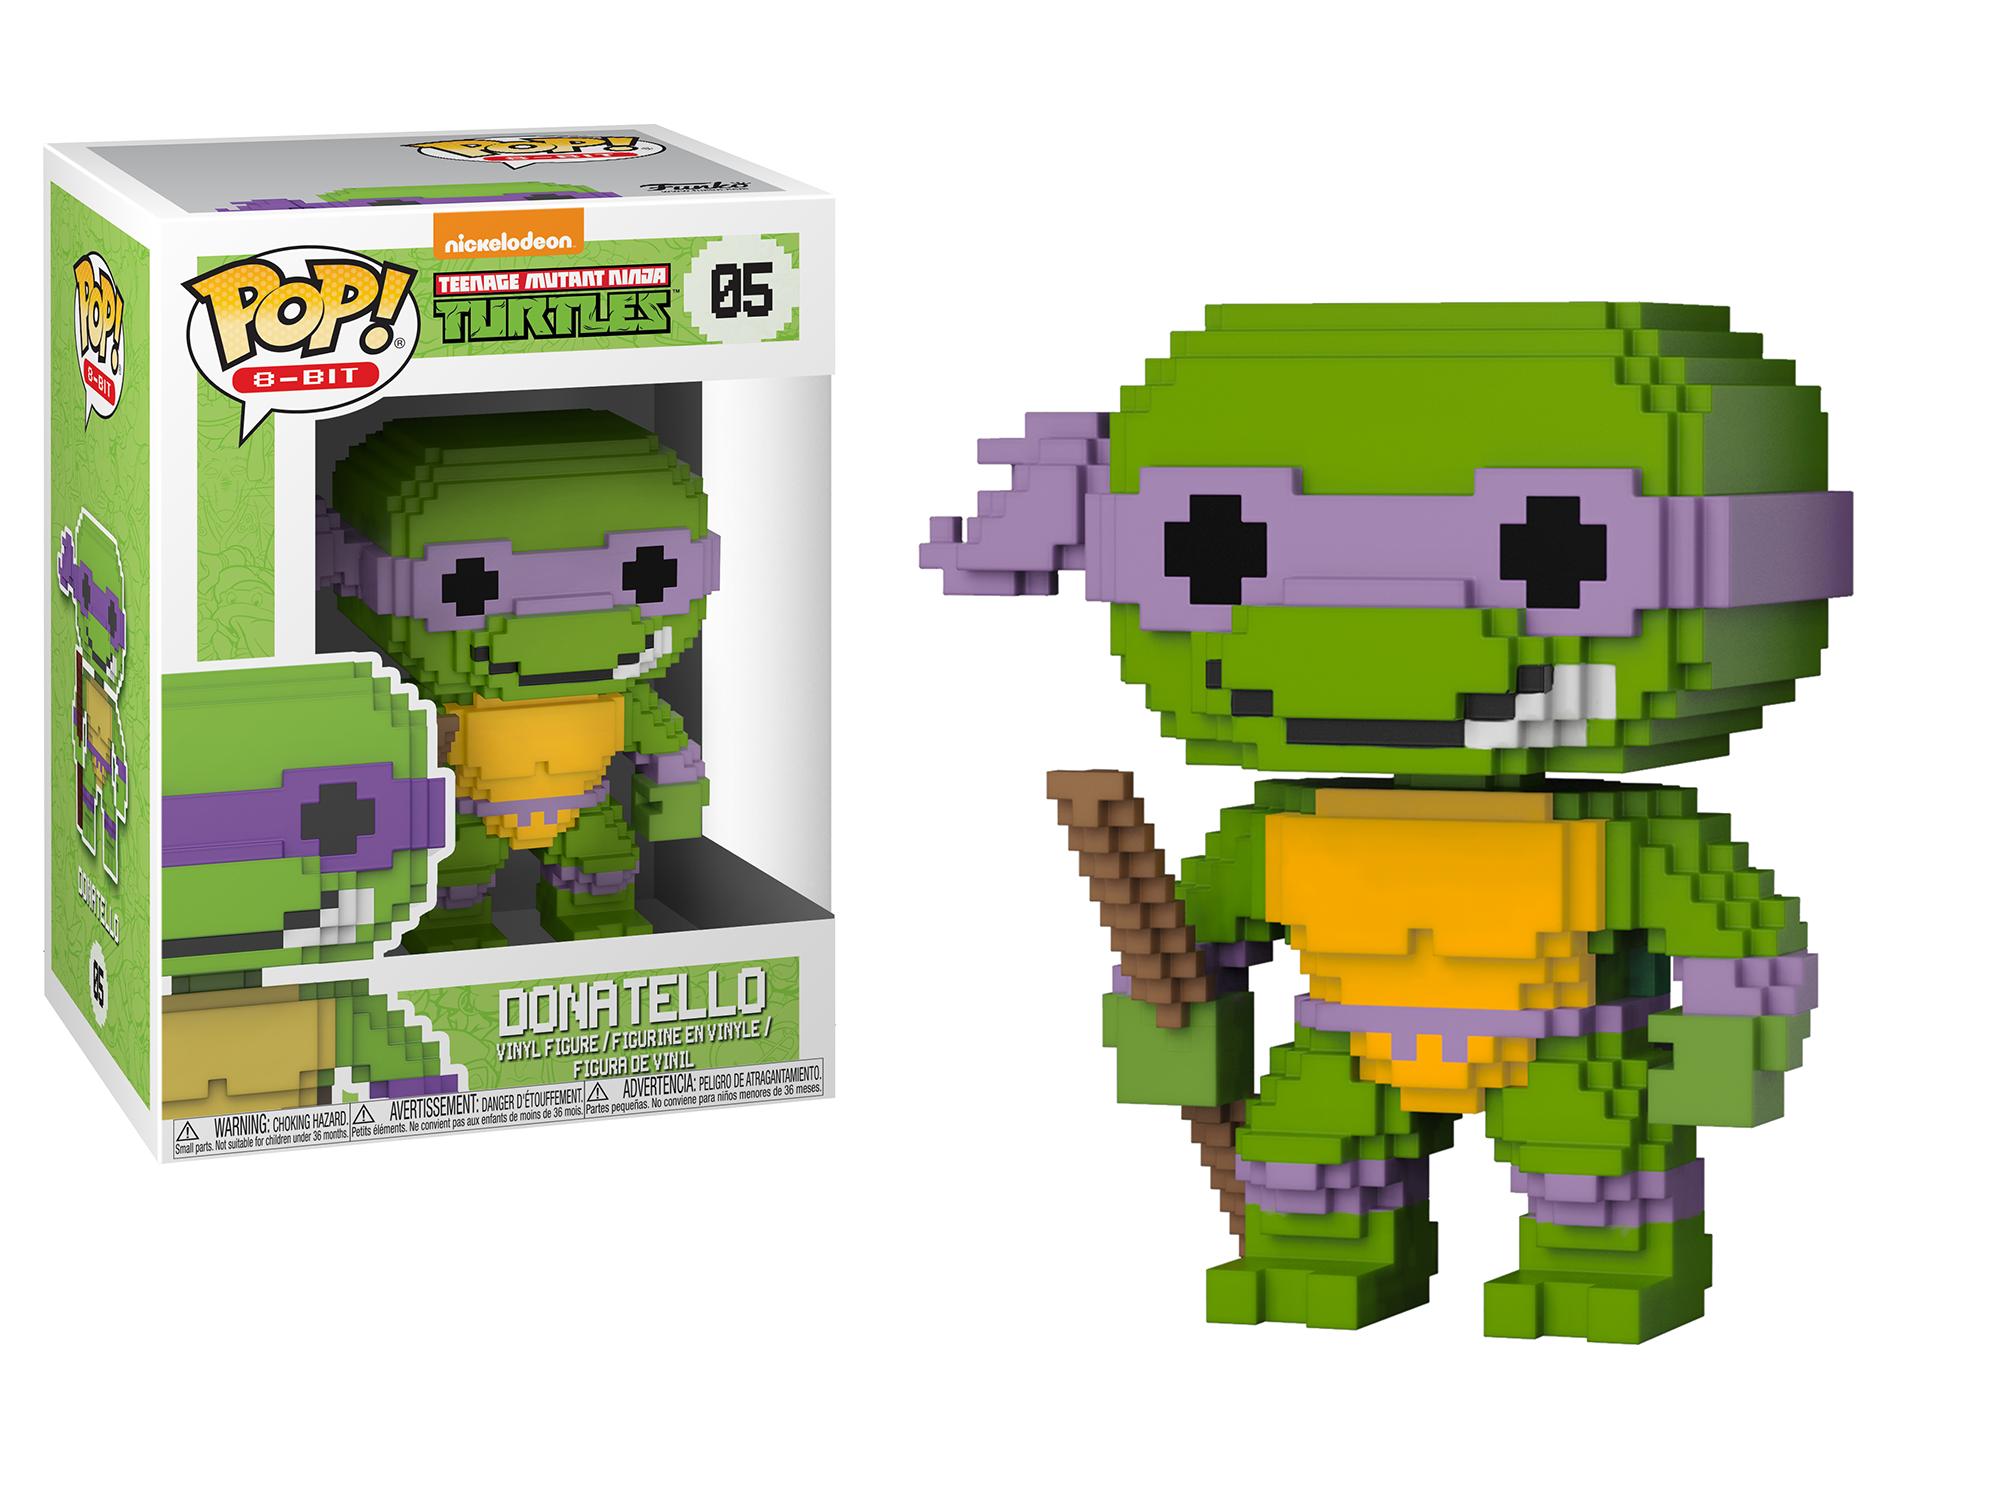 Funko Pop 8-Bit: Teenage Mutant Ninja Turtles - Donatello